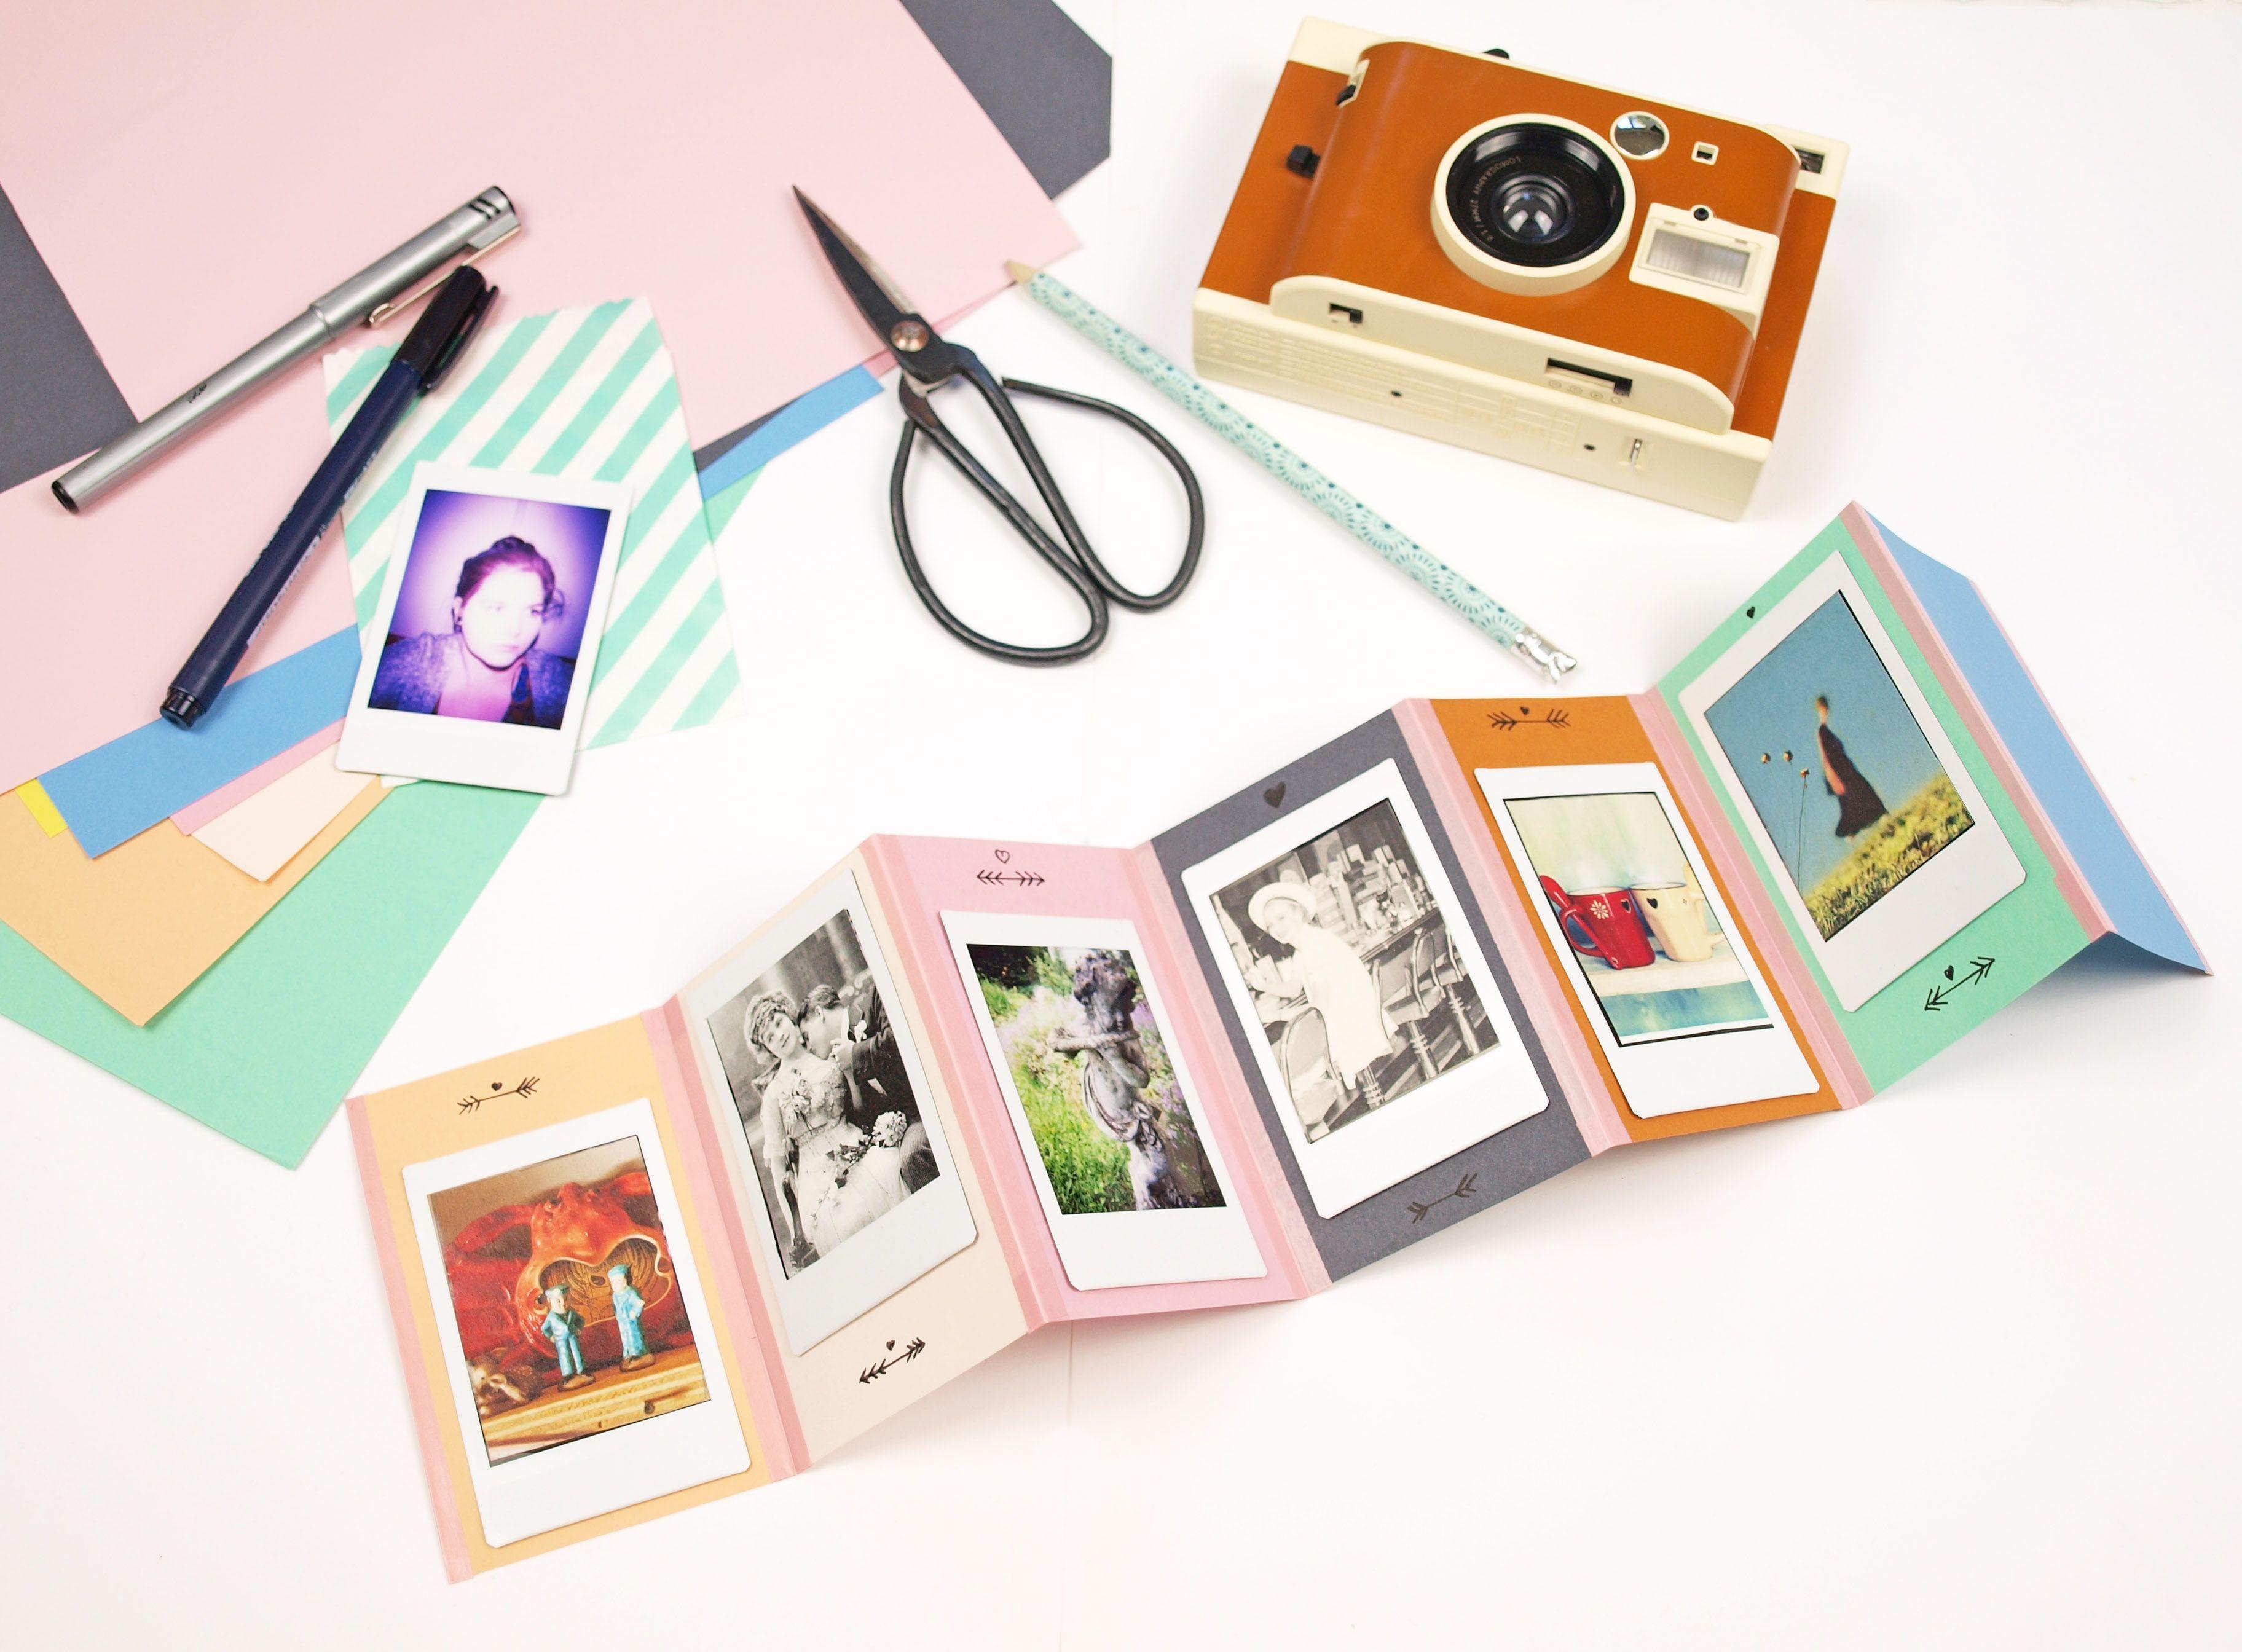 geschenkidee diy foto leporello und lomo instant kamera. Black Bedroom Furniture Sets. Home Design Ideas